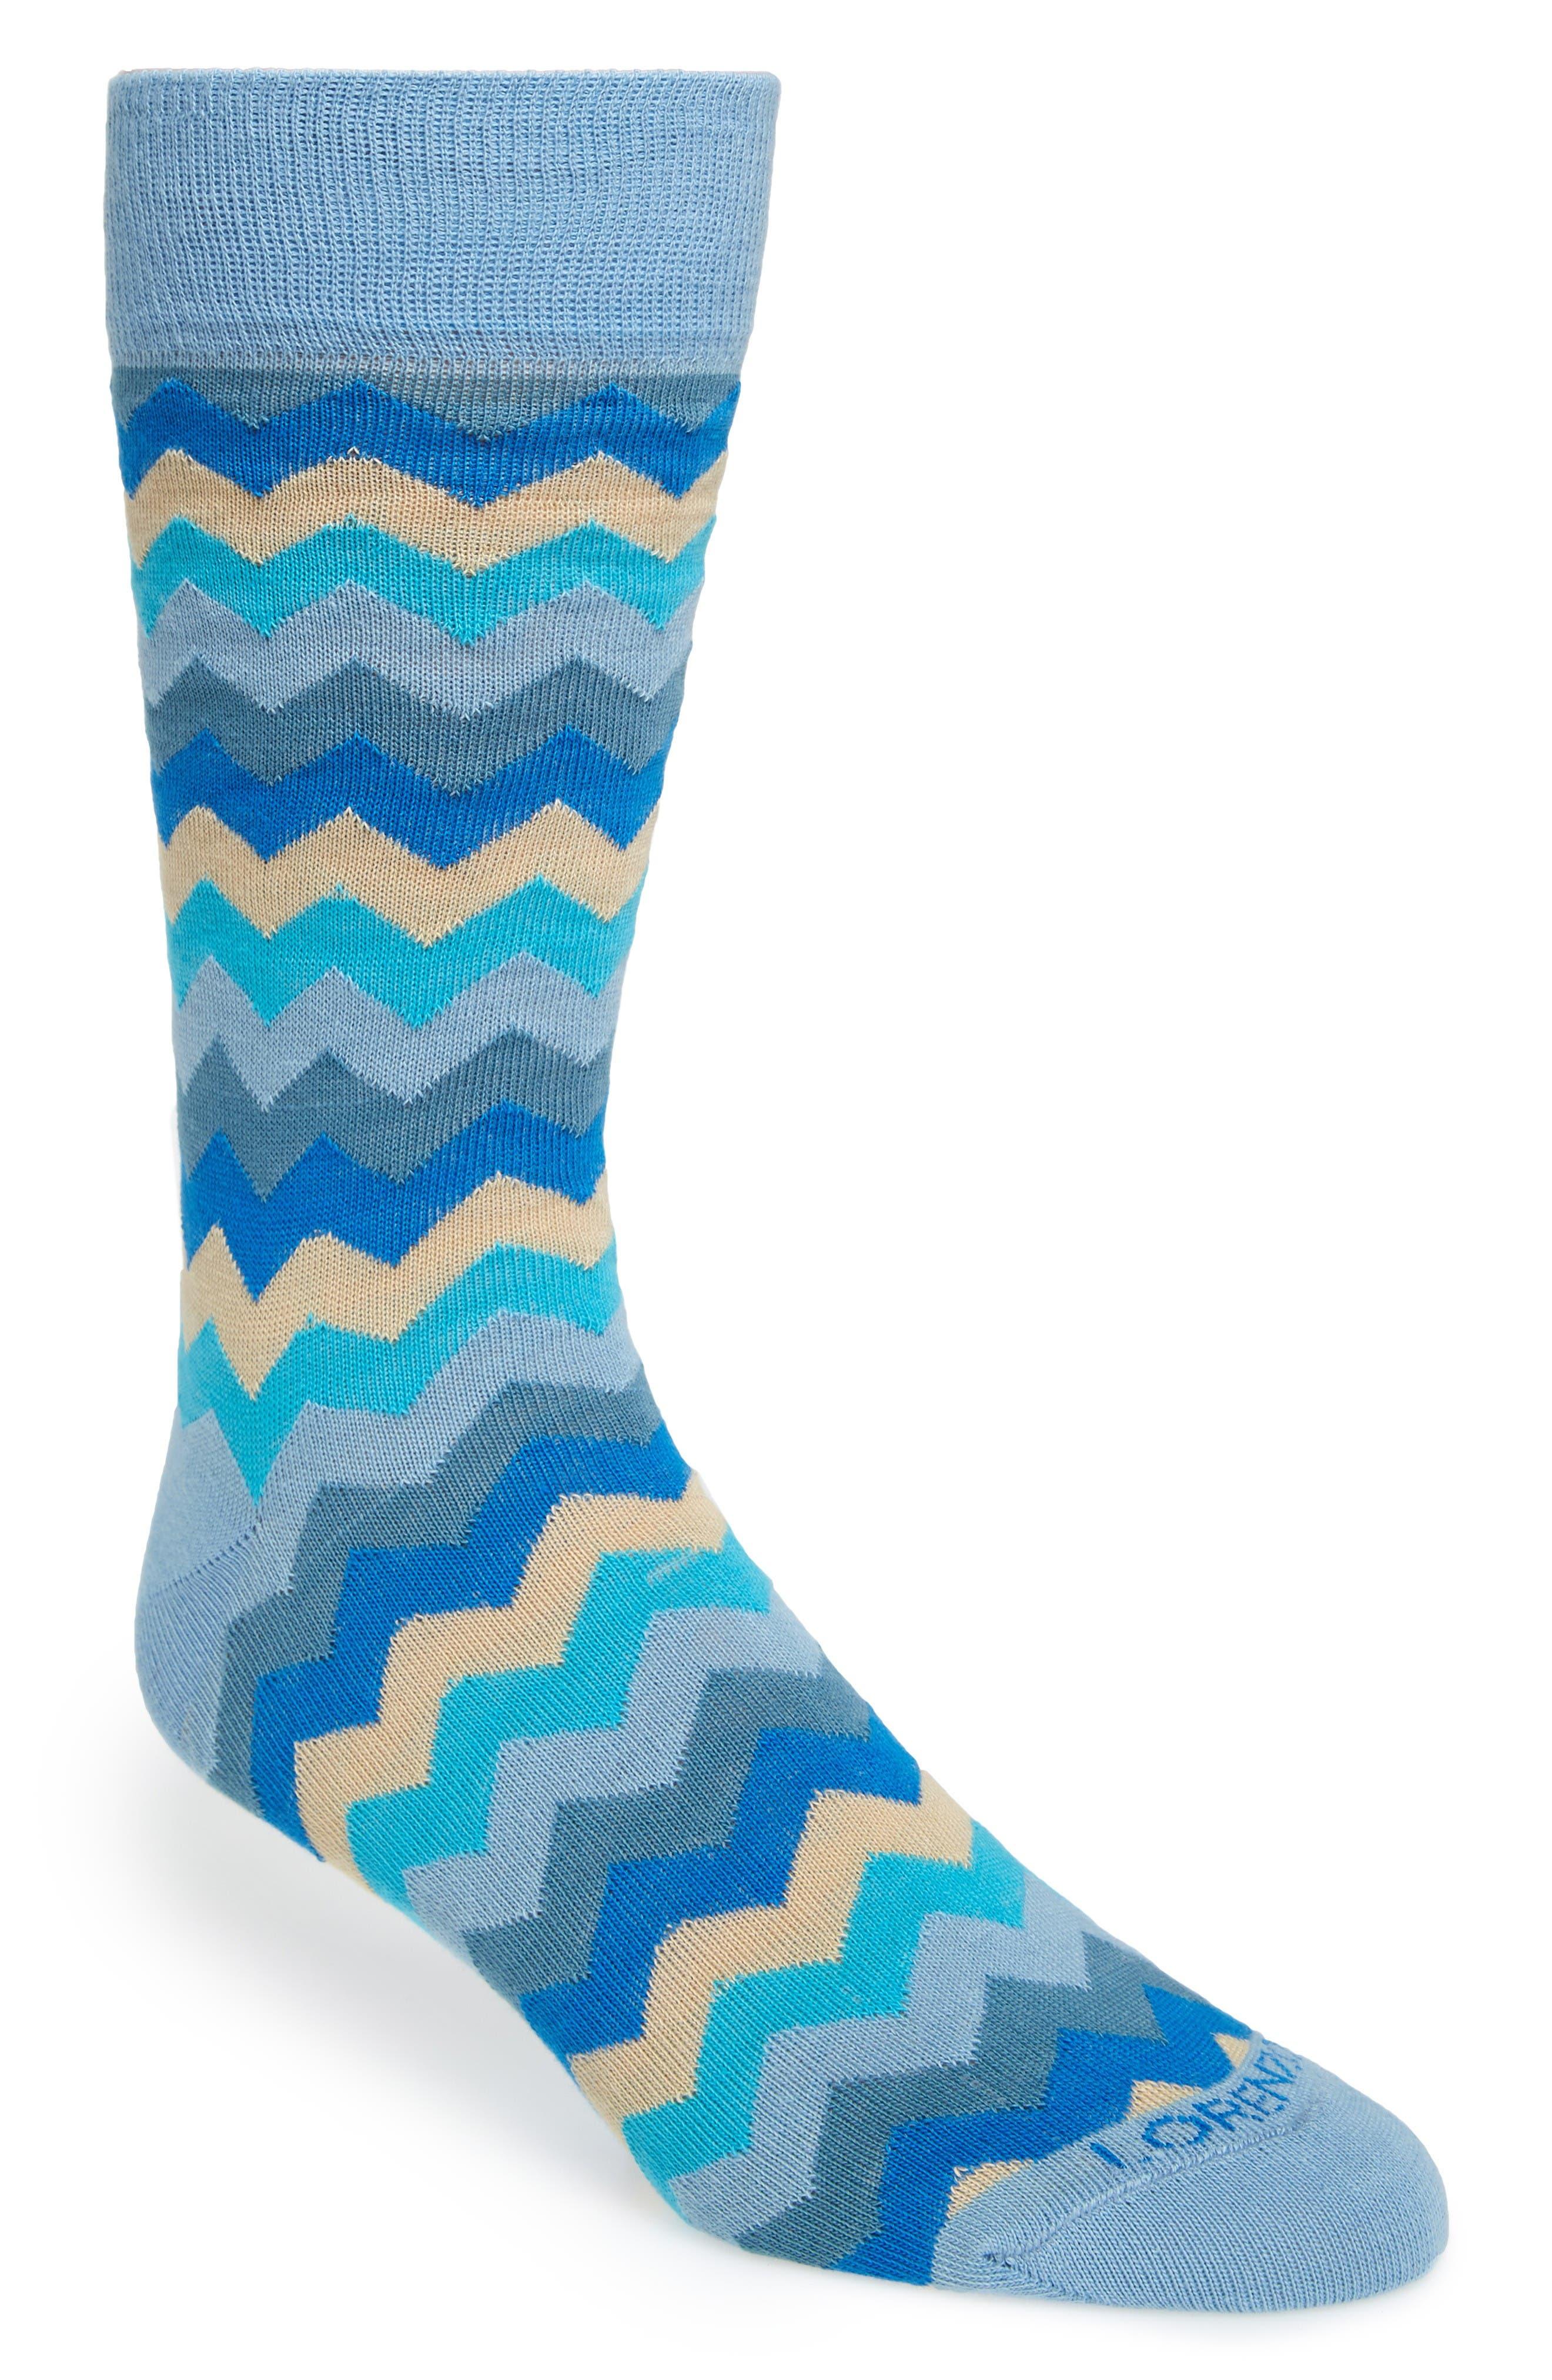 LORENZO UOMO Zigzag Socks